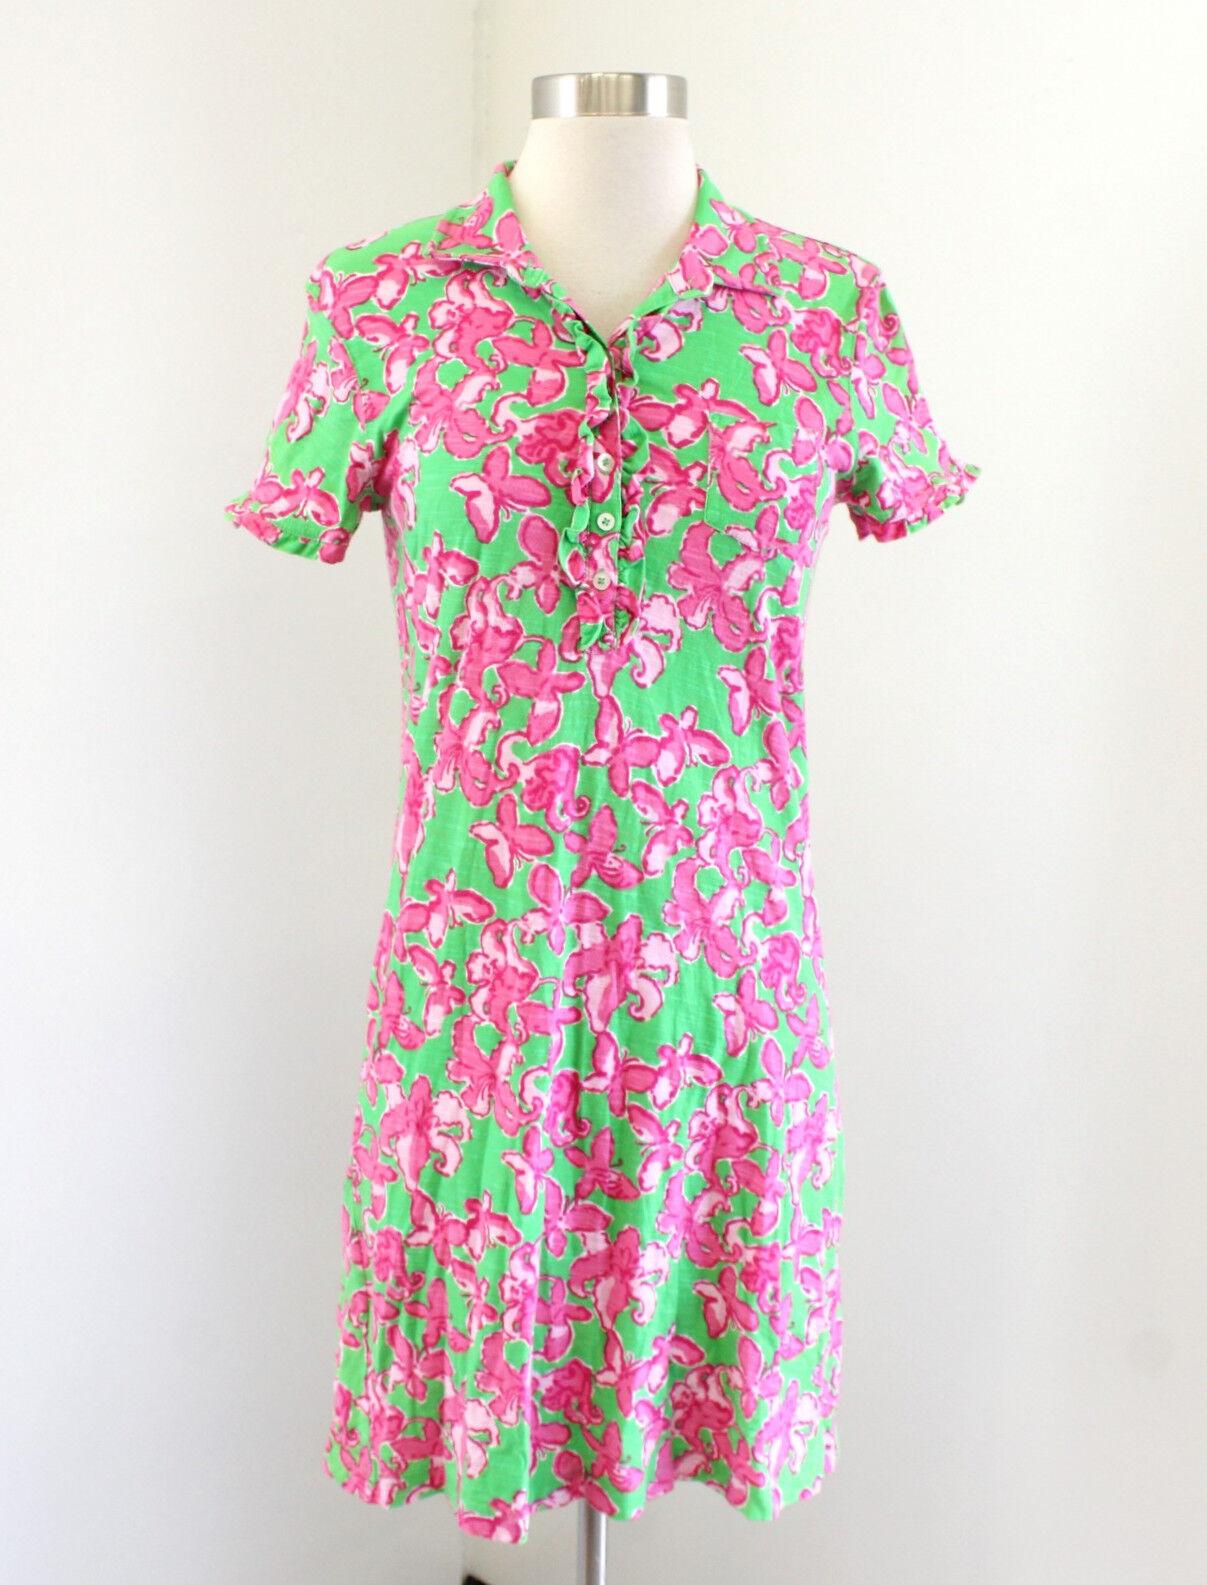 e24f6d66085 Lilly Pulitzer Carolyn Dress Green Pink Floral Butterfly Print Ruffle Trim  Sz S